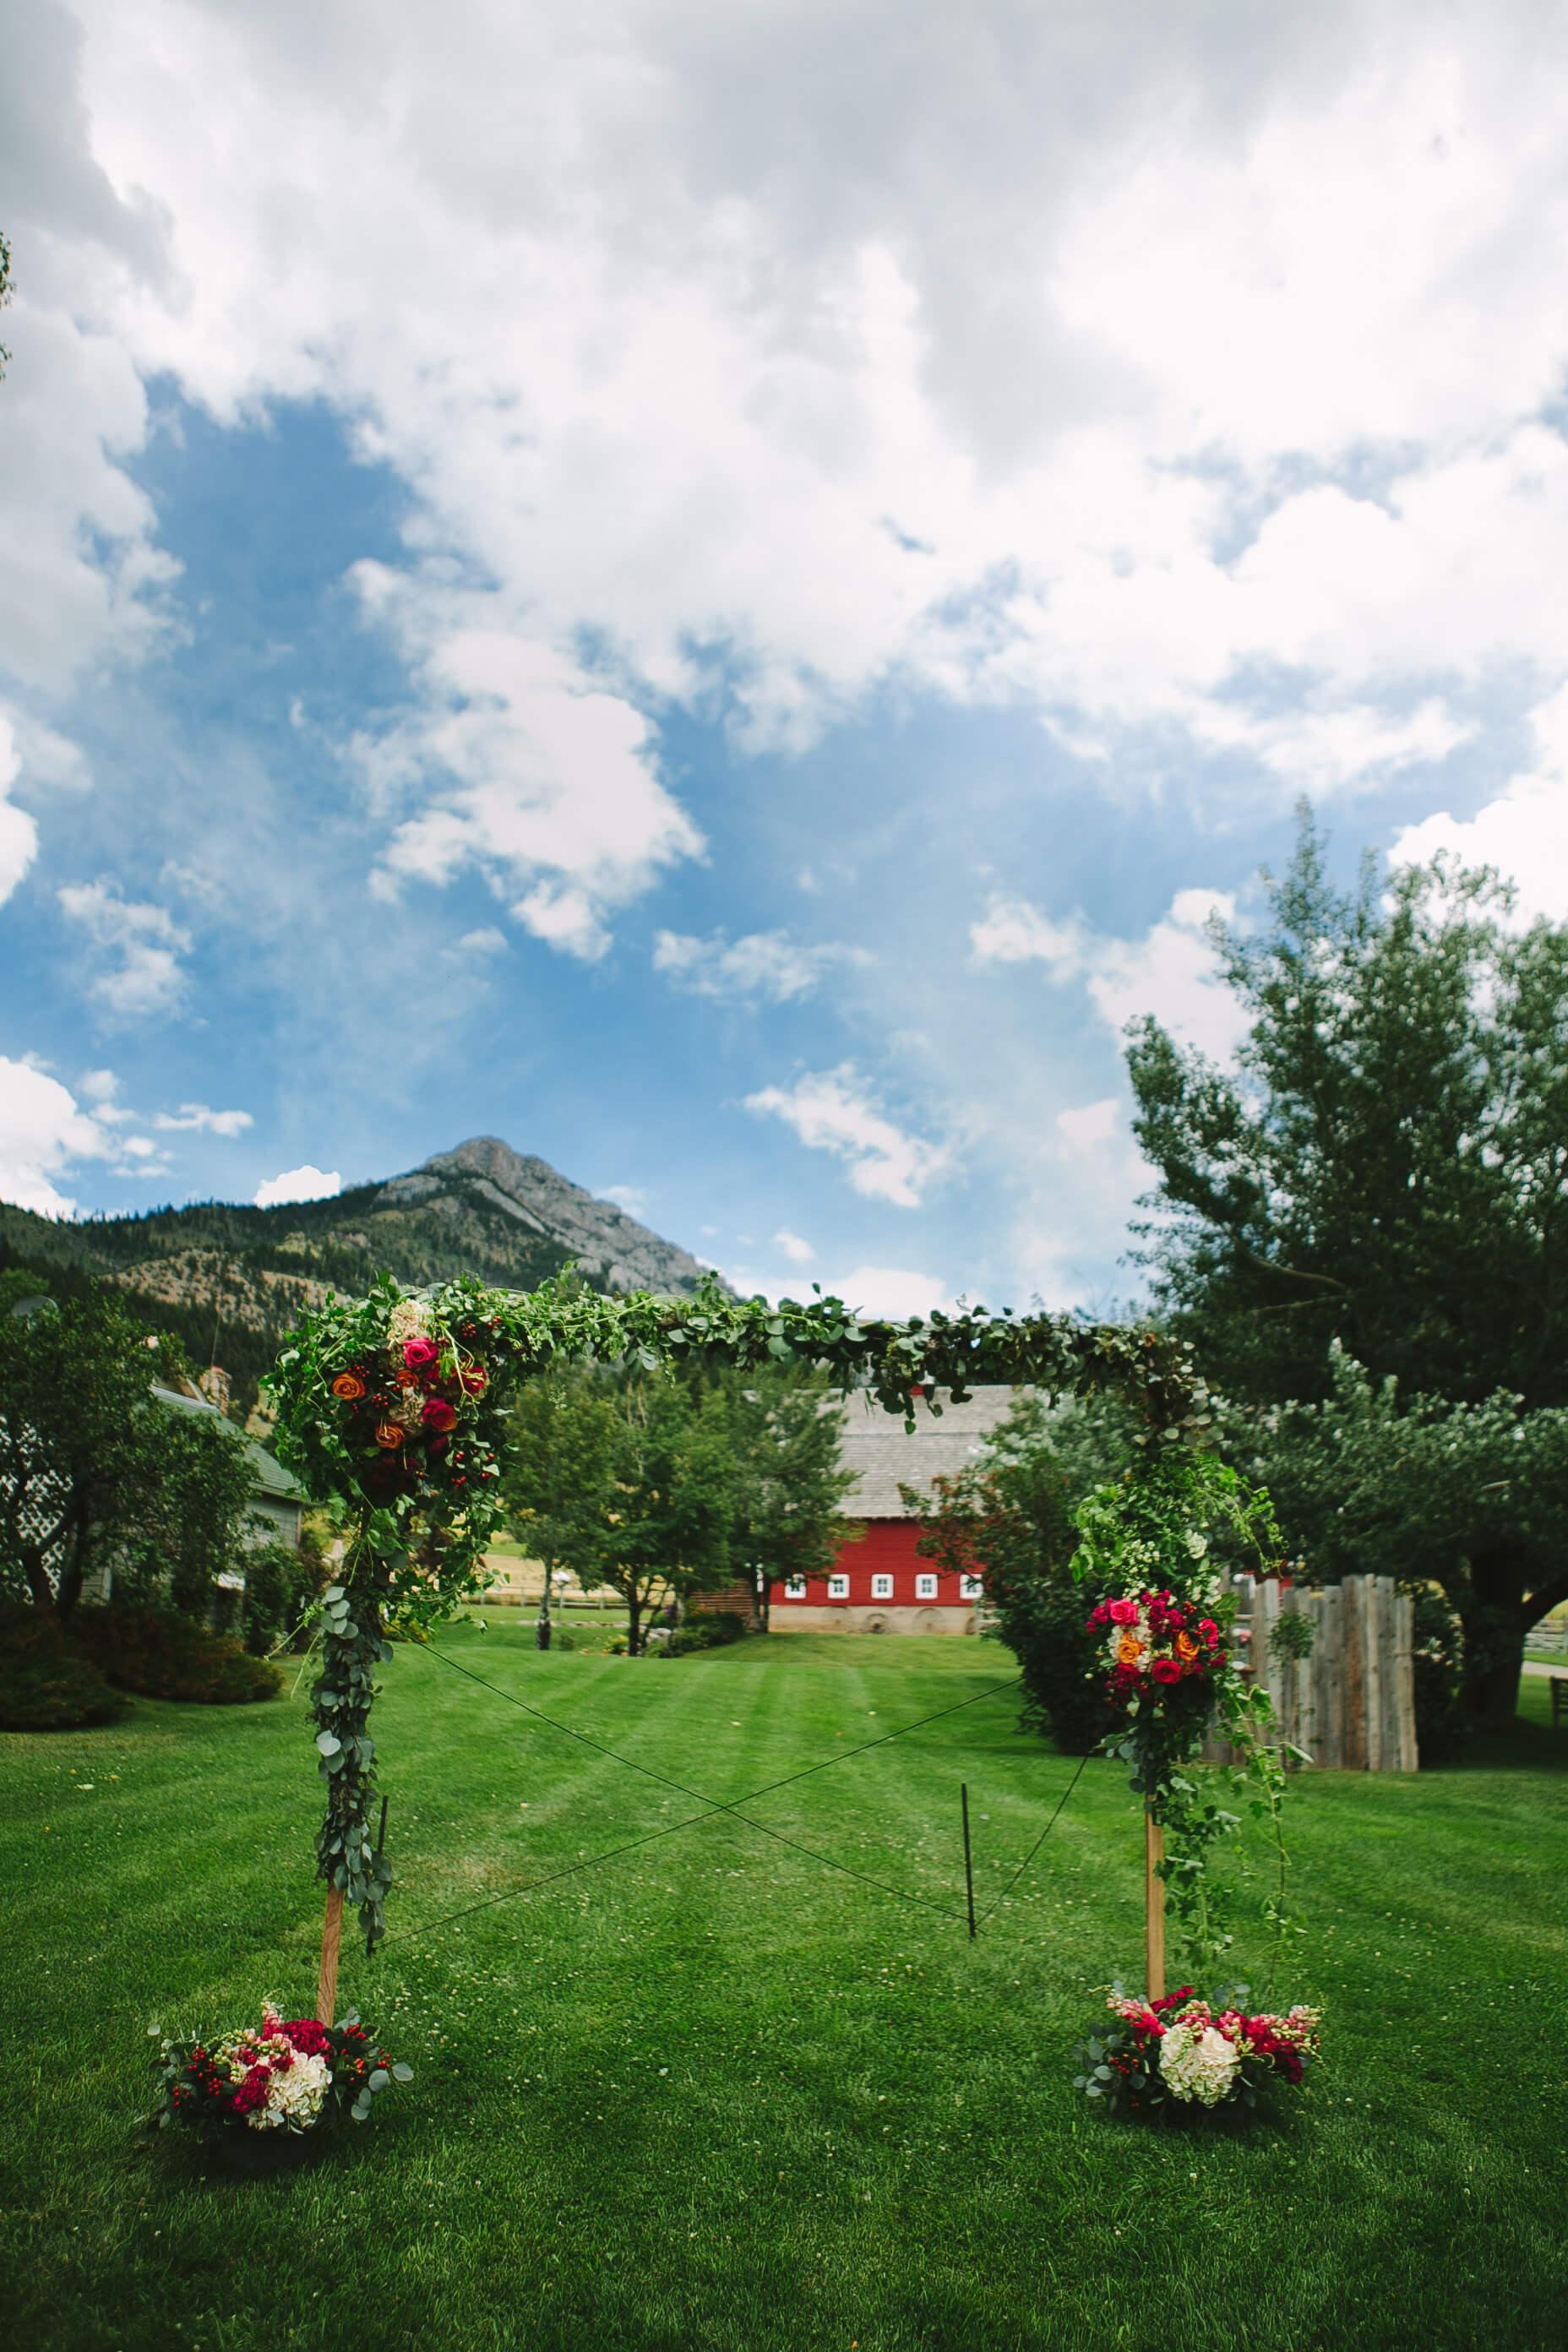 engle-olson-fran-ze-photo-montana-wedding-56.jpg